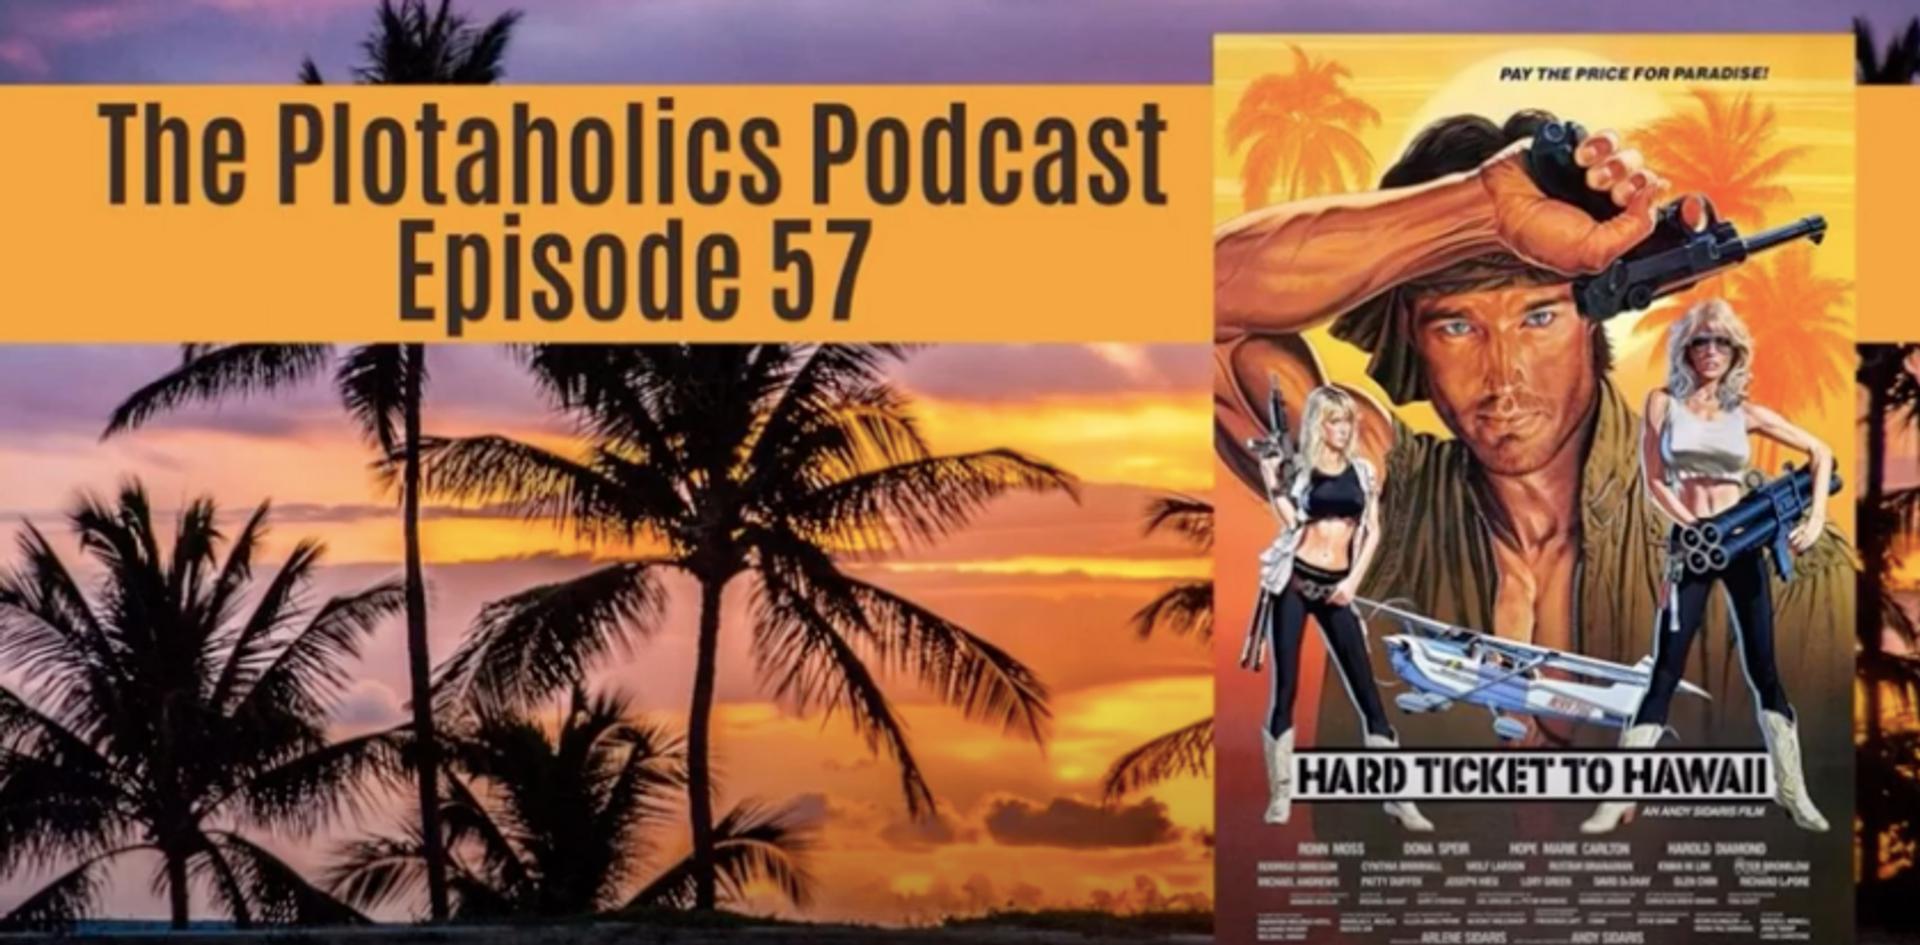 The Plotaholics Podcast on Hard Ticket to Hawaii!